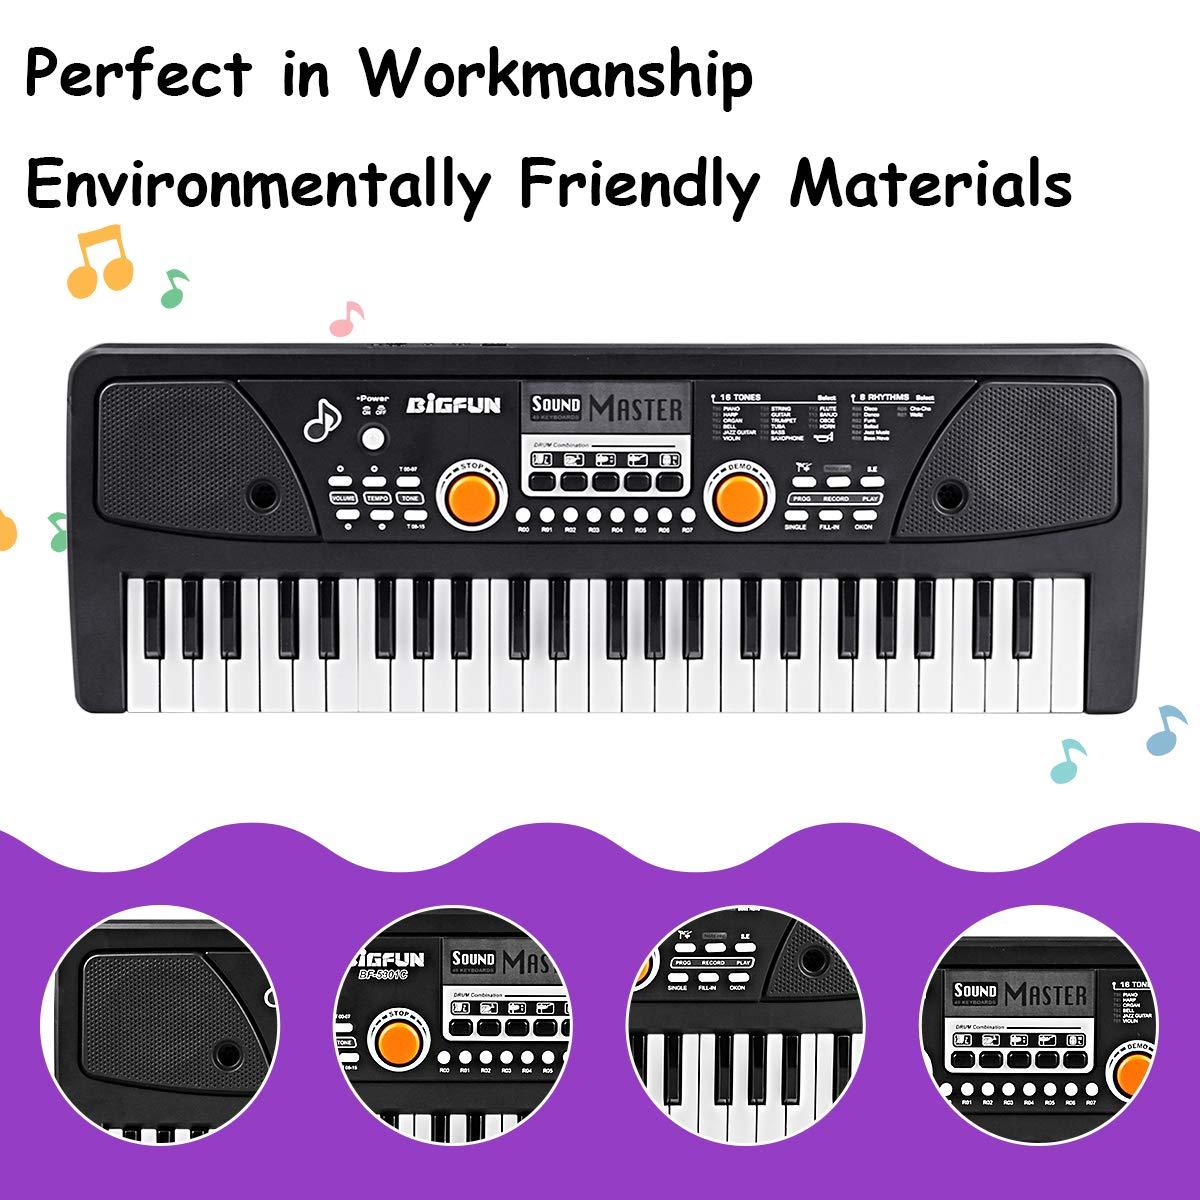 RenFox 49 Key Piano Keyboard Portable Electronic Kids Piano Keyboard Beginner Digital Music Piano Keyboard & Microphone Teaching Toy Gift for Kids Boy Girl by RenFox (Image #5)